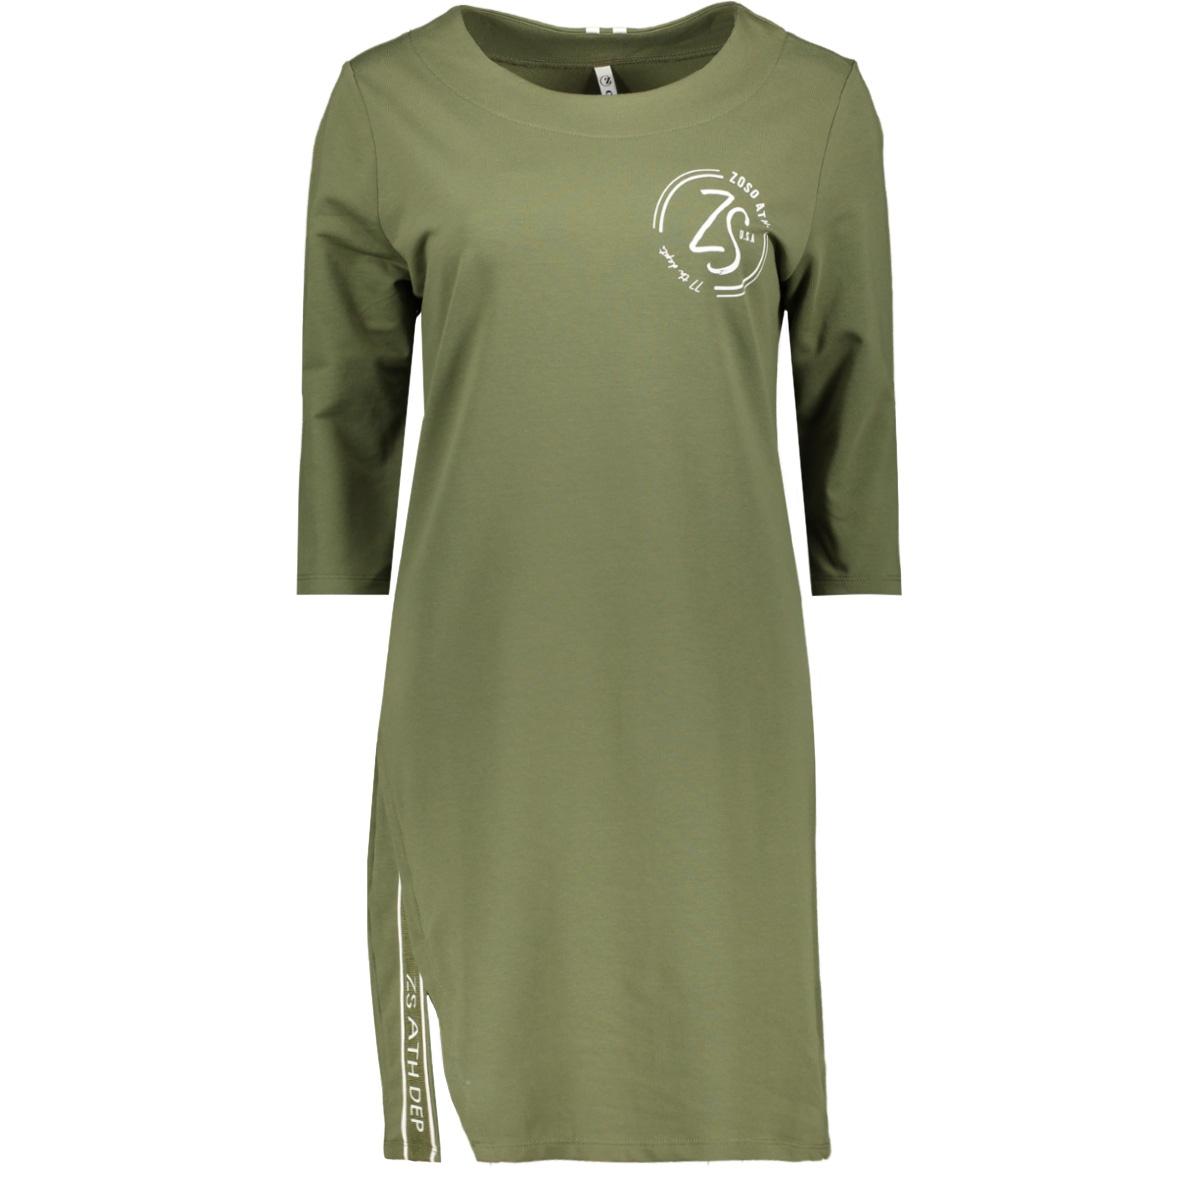 sweat tunic sr1920 zoso tuniek army/offwhite